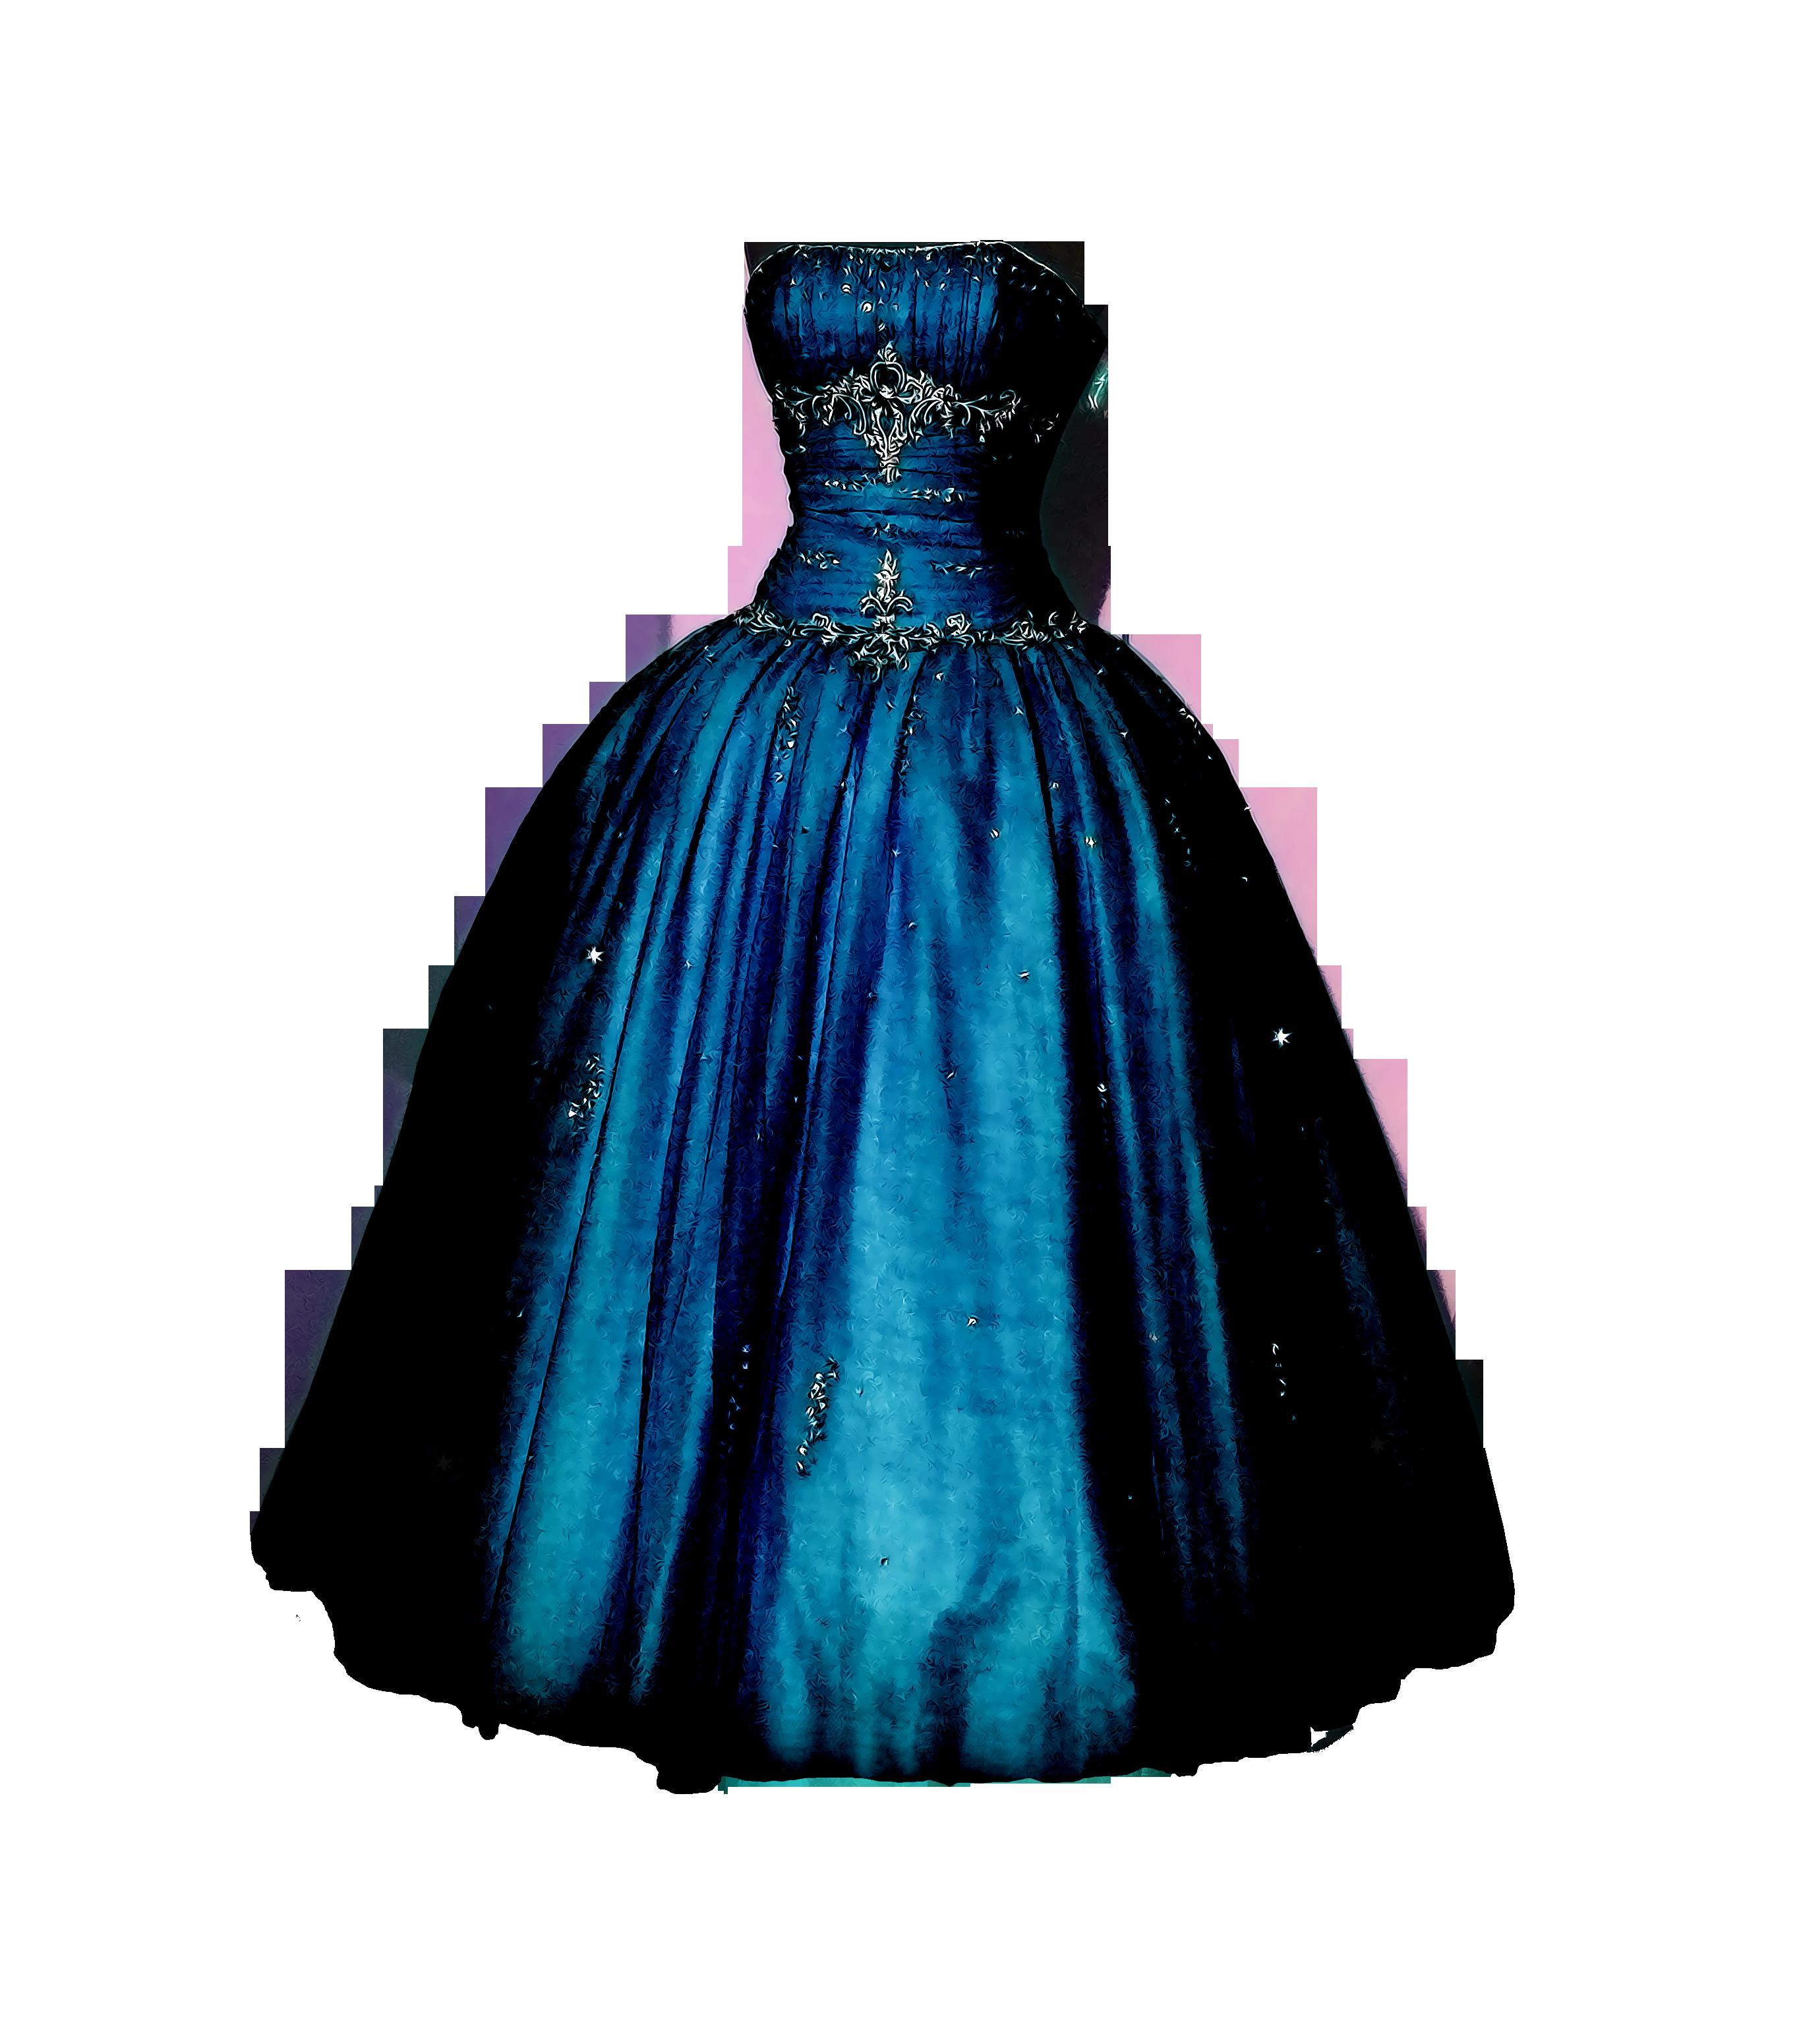 Png mart. Girly clipart dress hanger